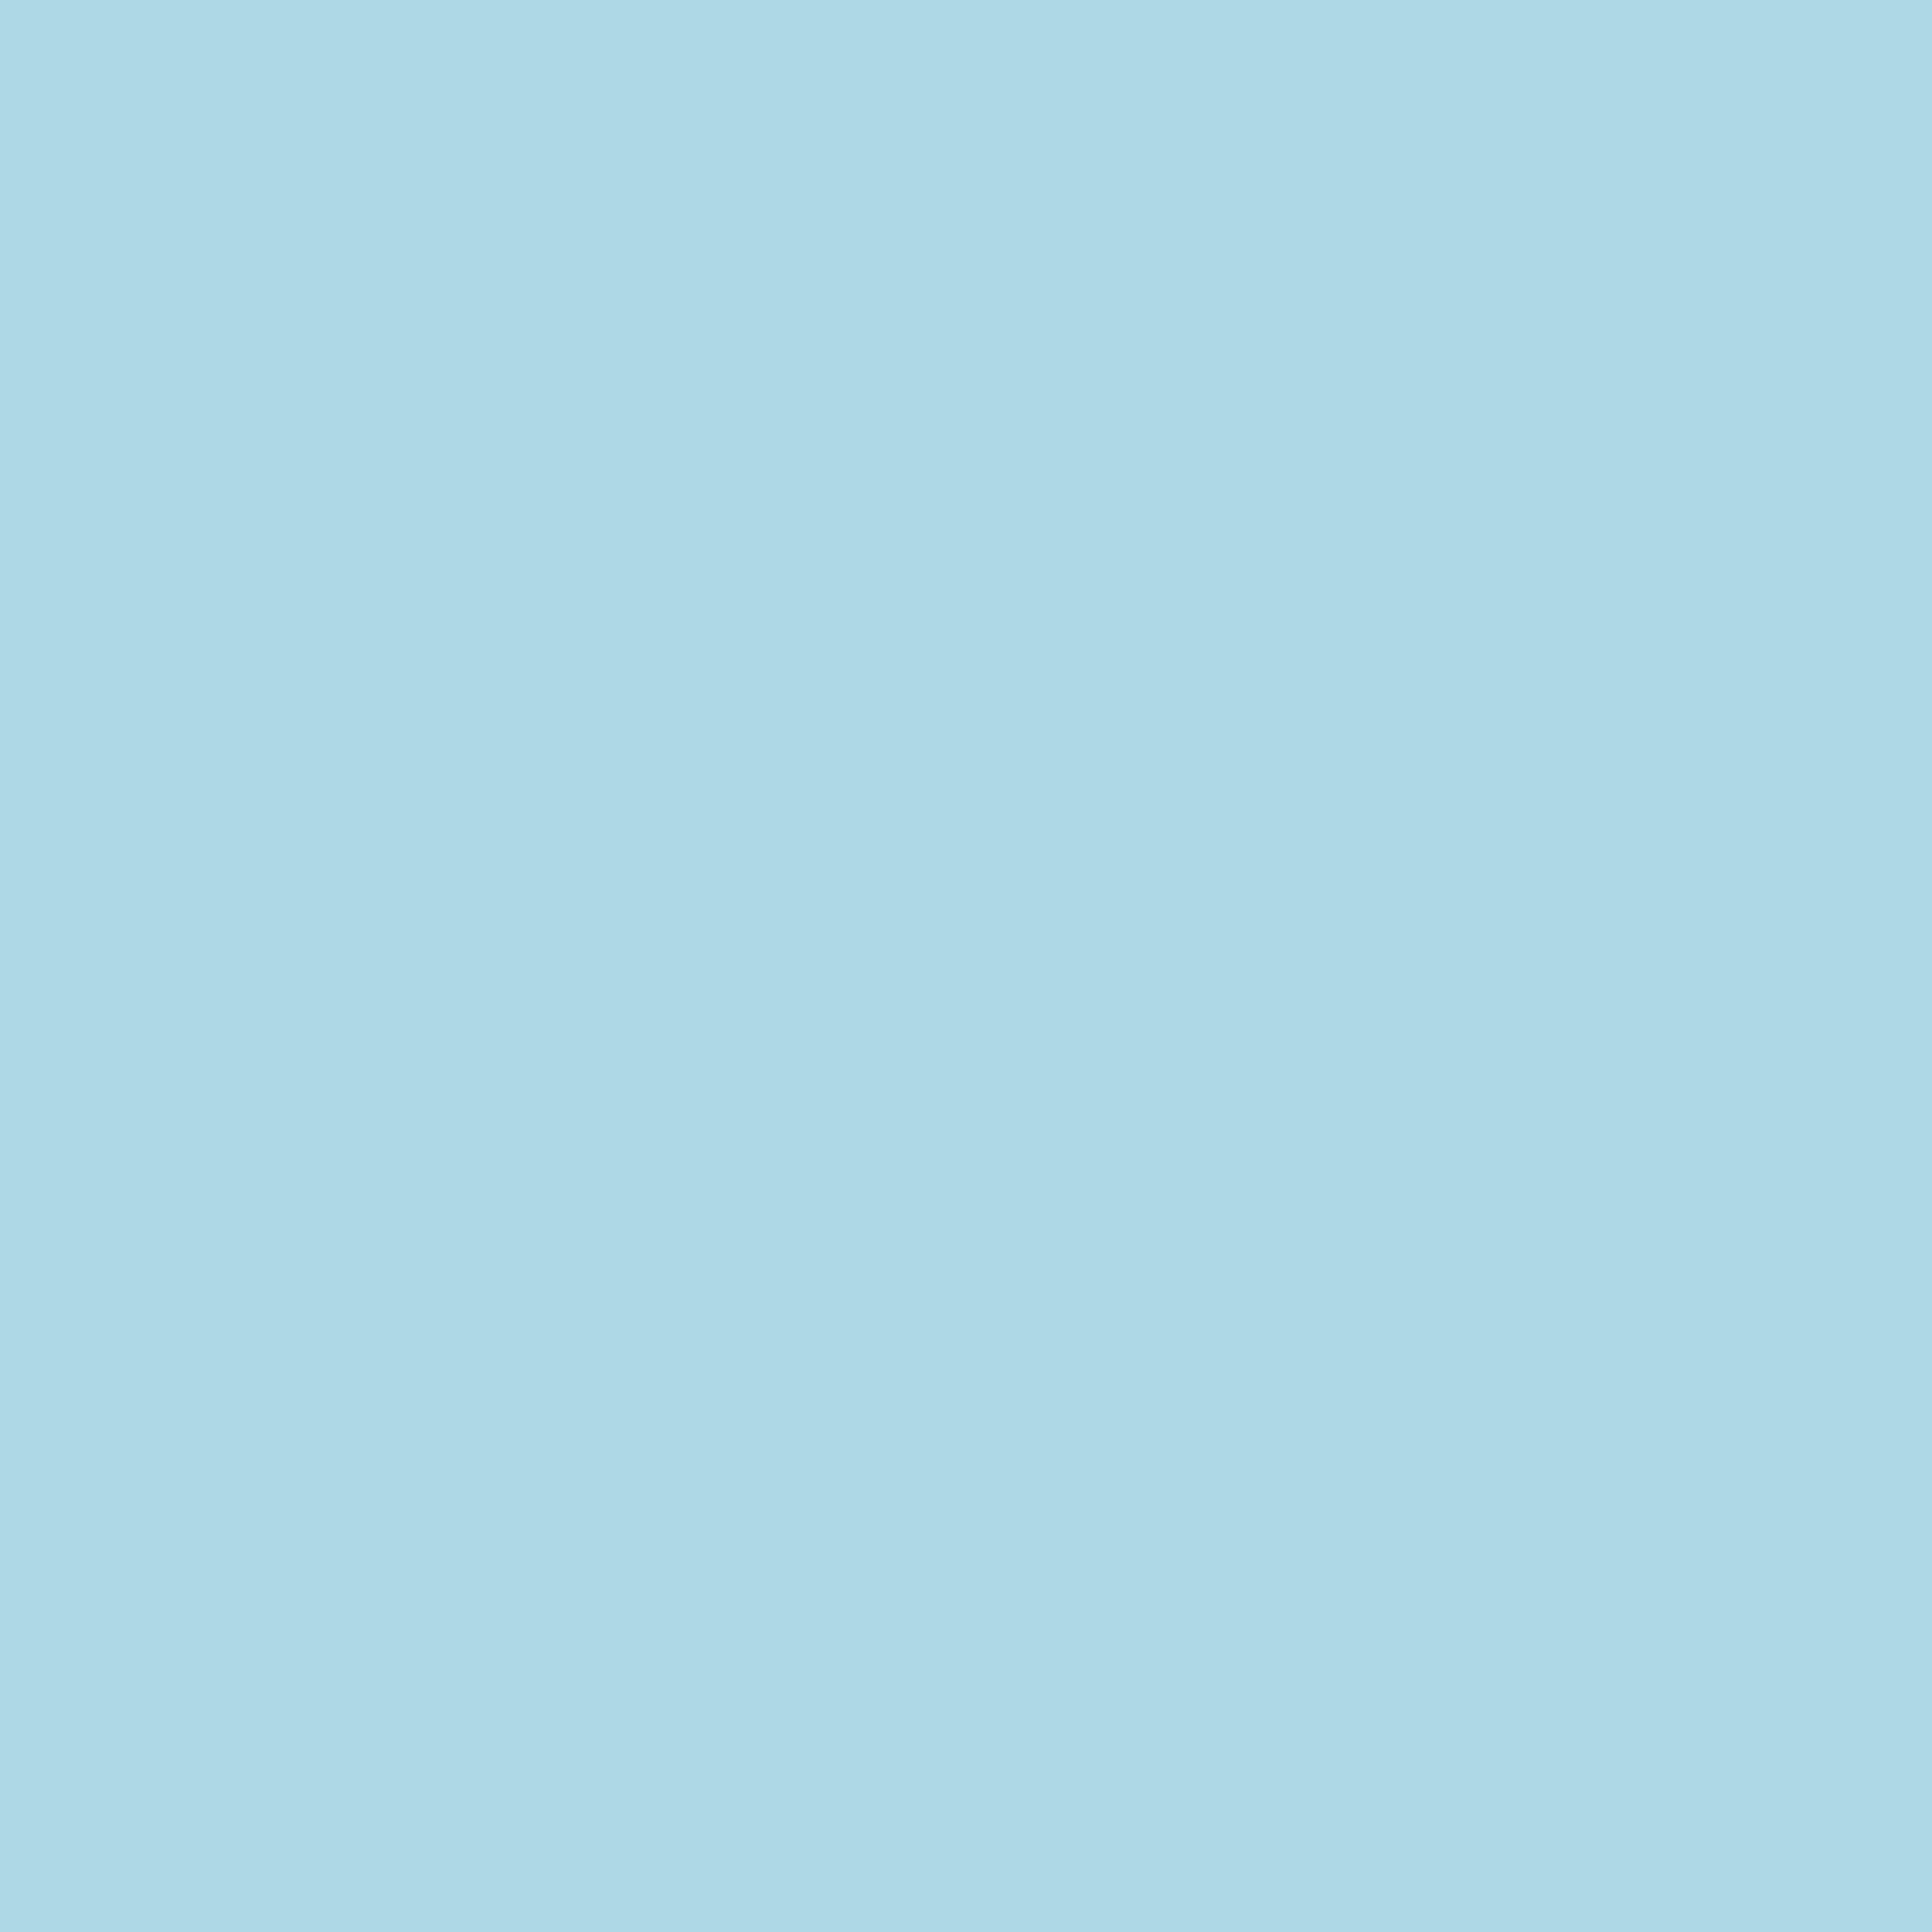 2048x2048 Light Blue Solid Color Background